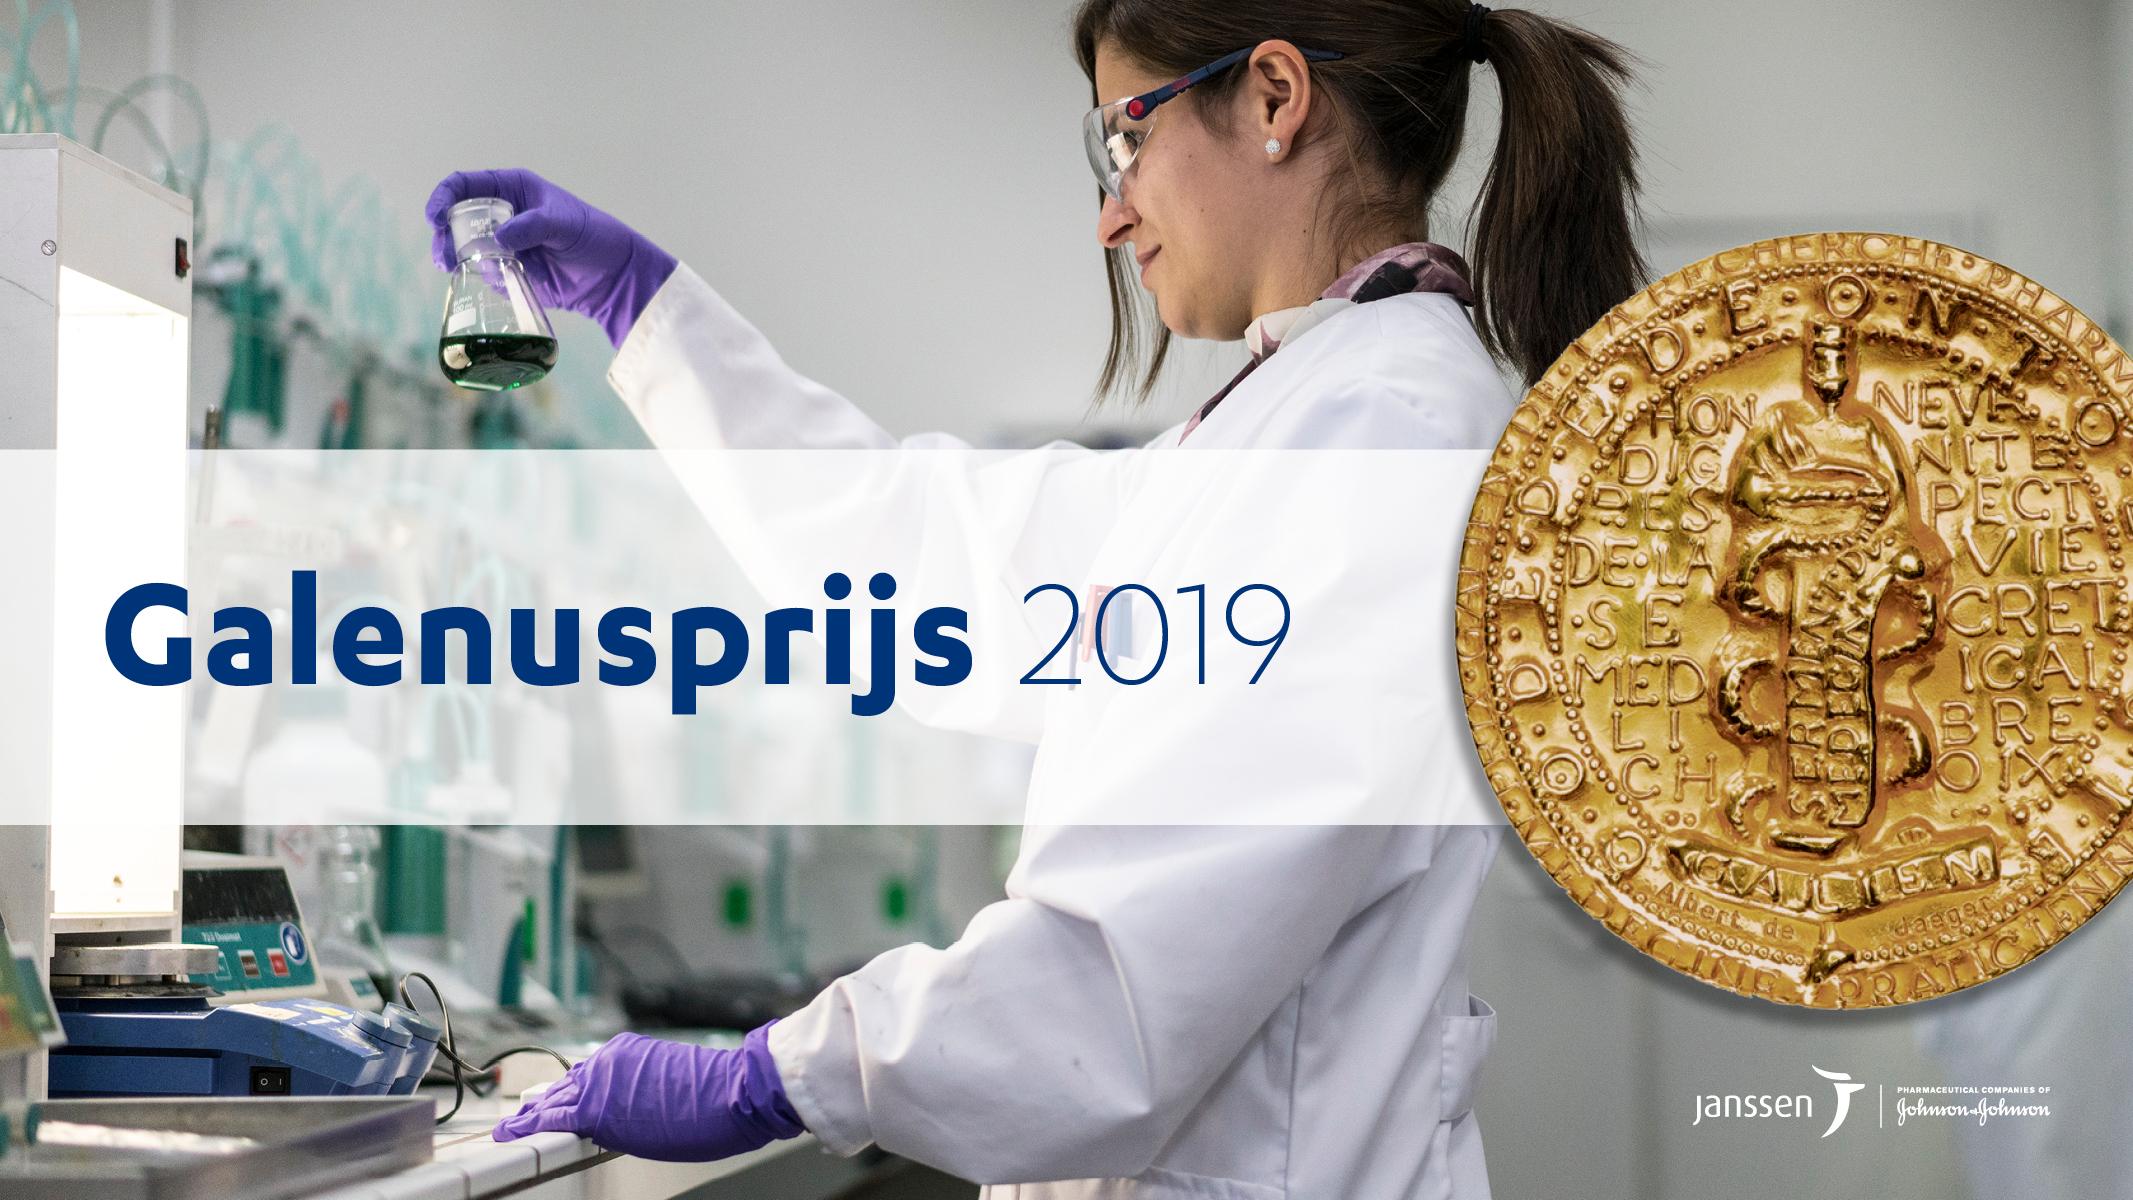 Galenusprijs 2019